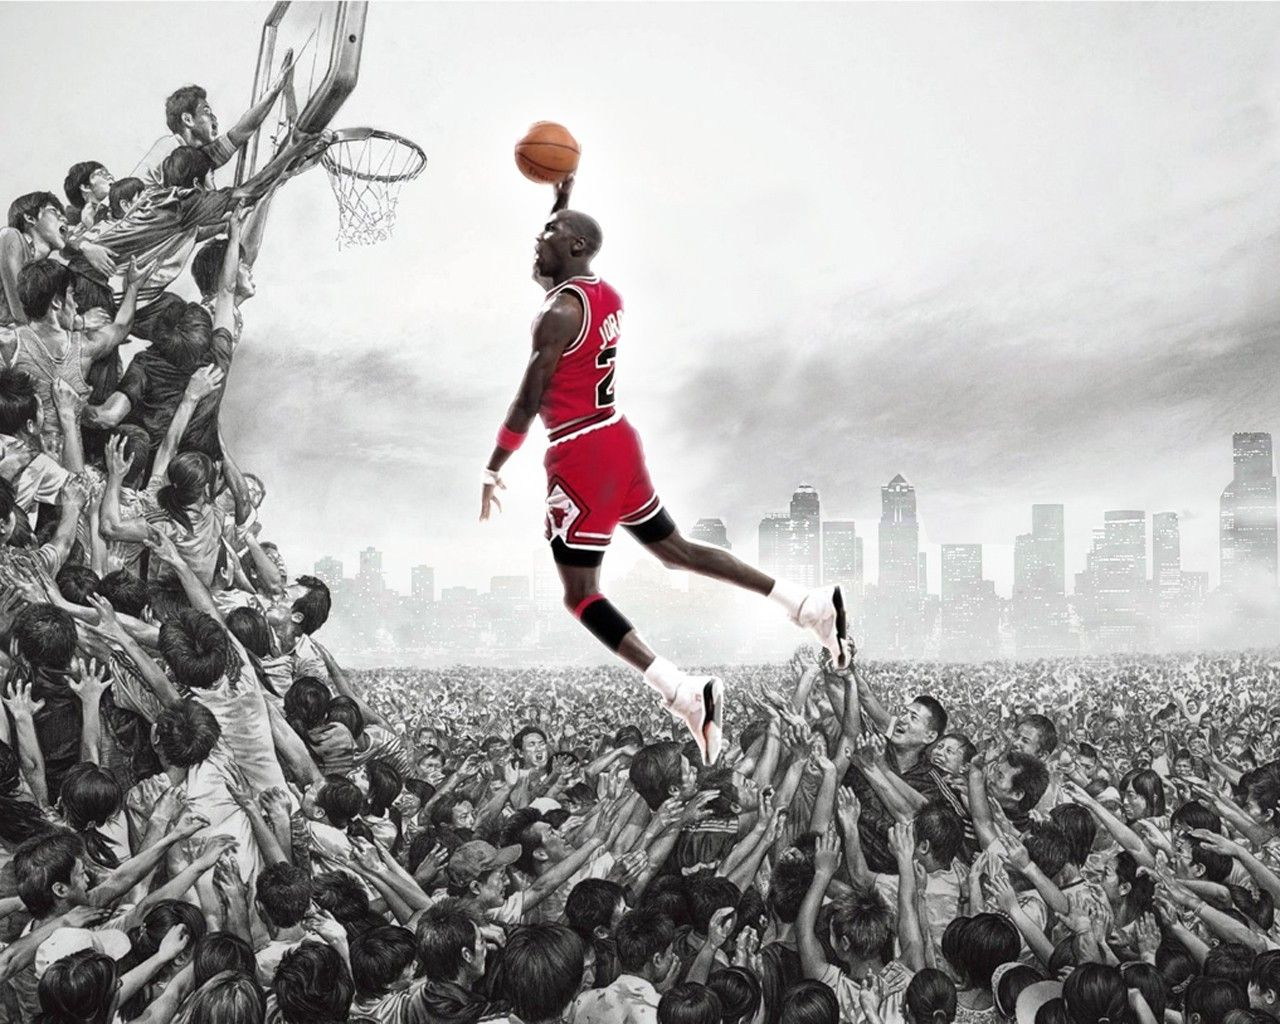 Hd Basketball 4k Photos